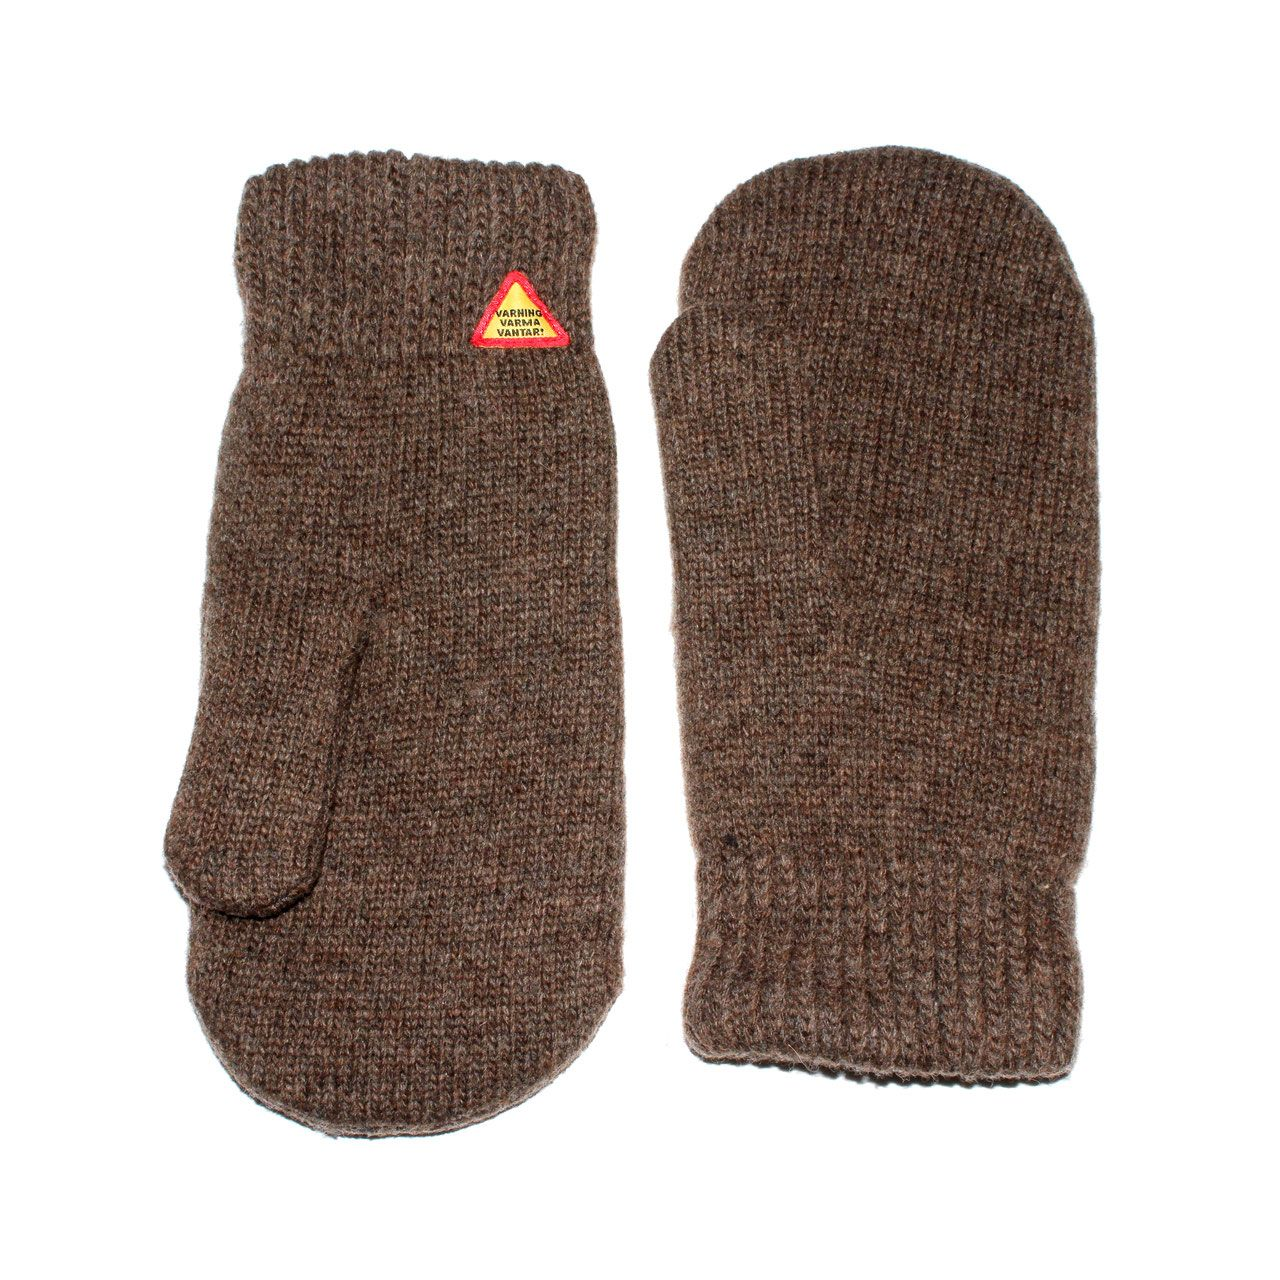 Pin On Ojbro Swedish Made 100 Wool Mittens And Socks